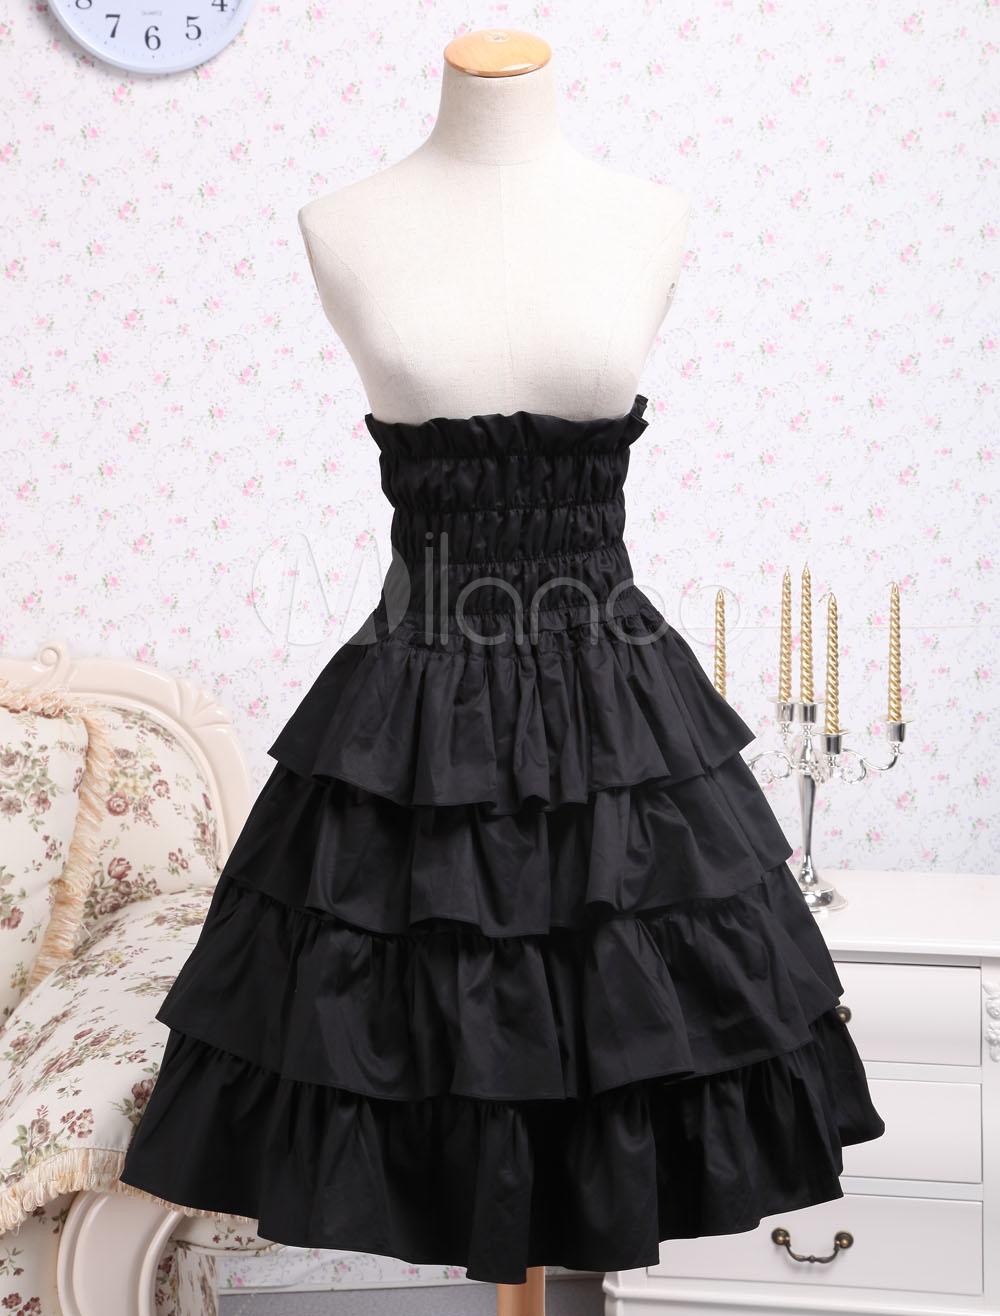 Classic Cotton Black Ruffle Lolita Skirt